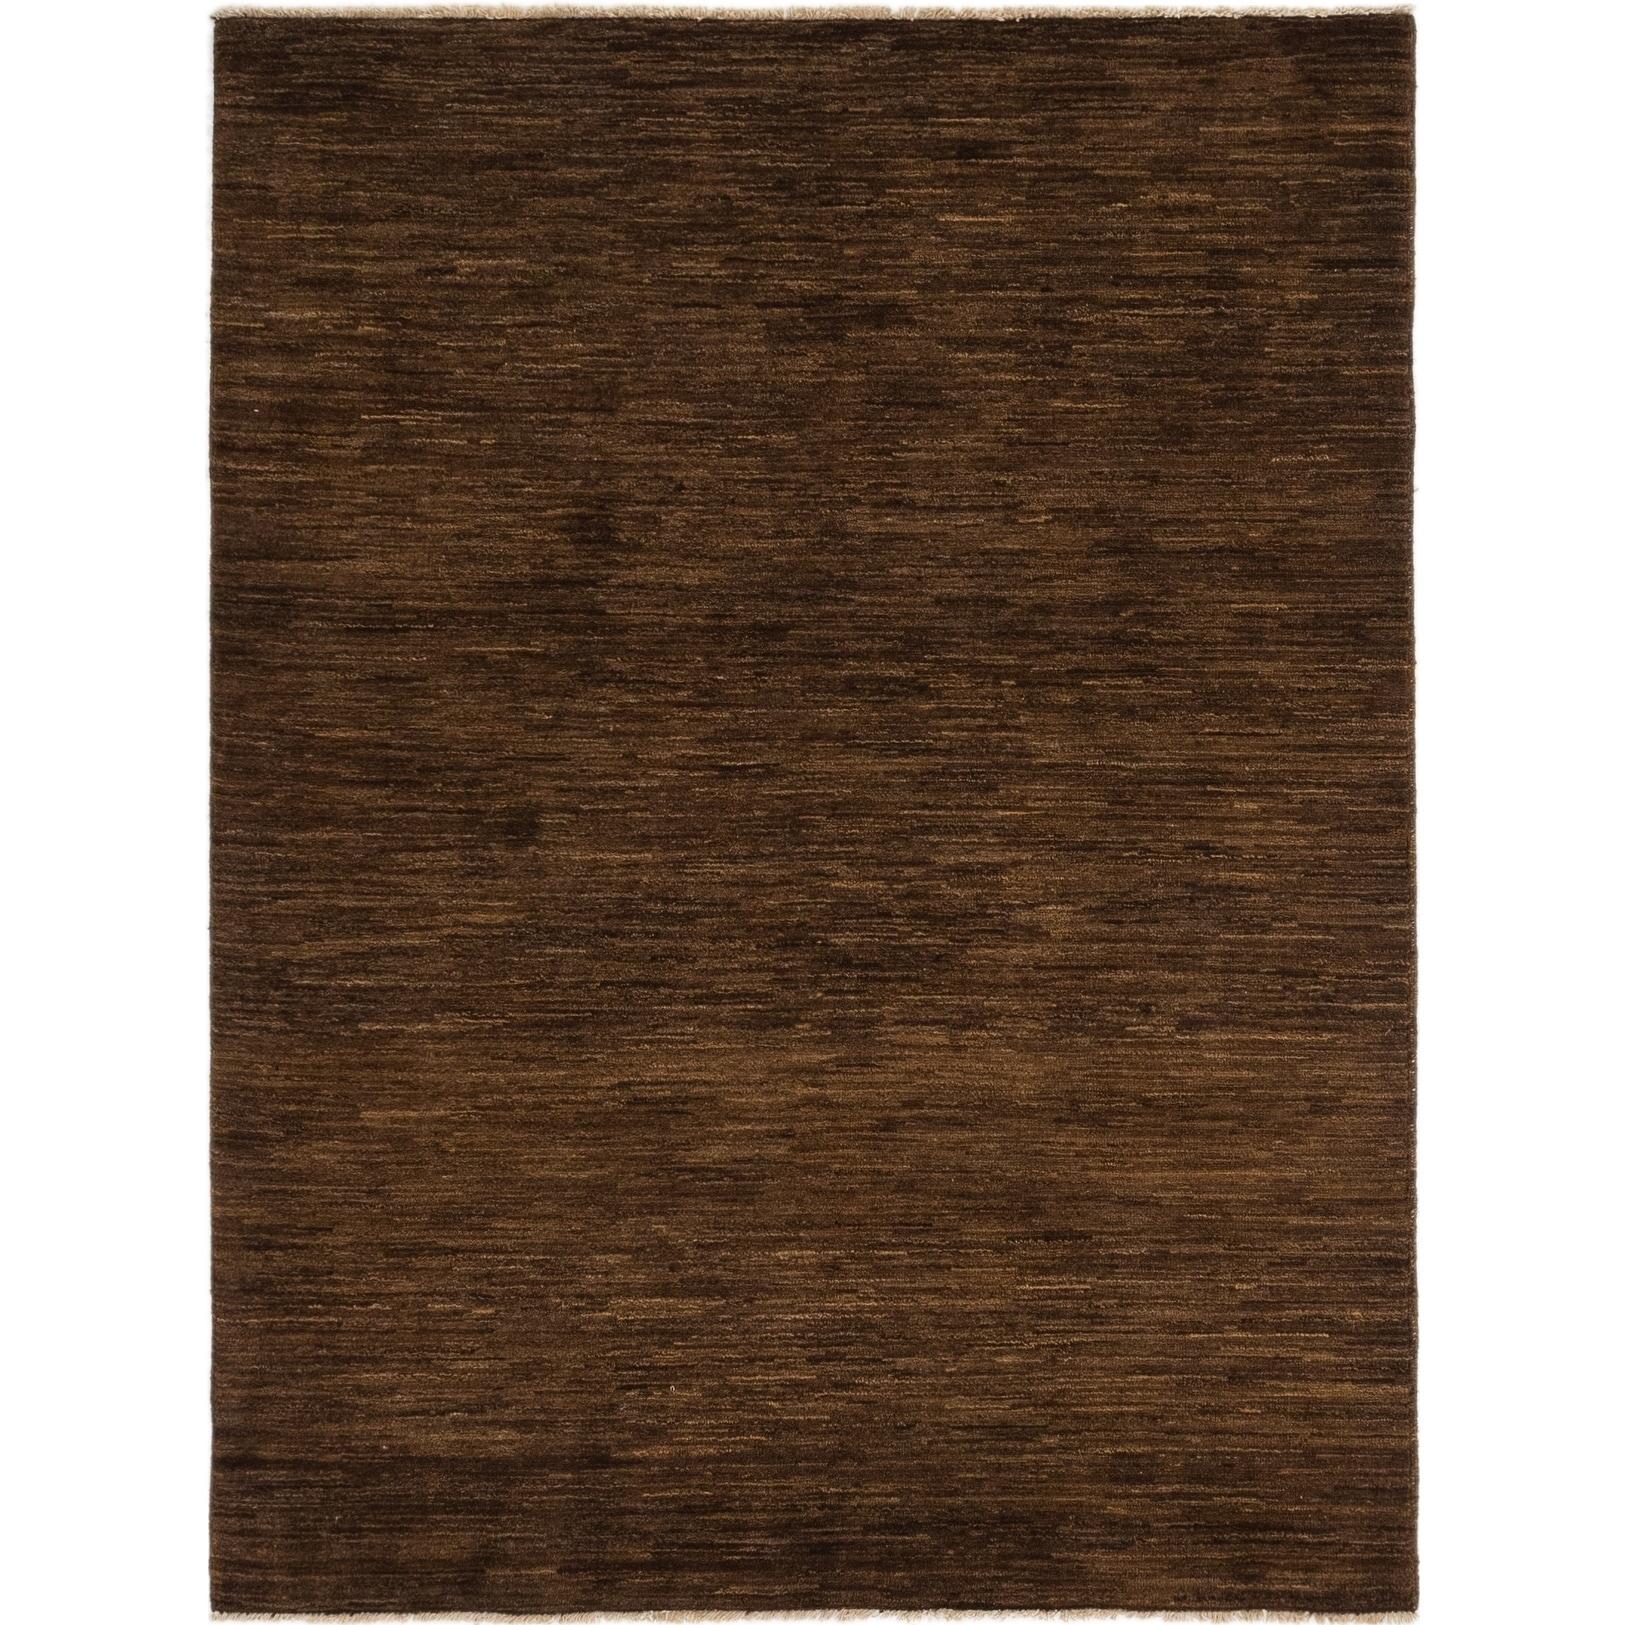 Hand Knotted Kashkuli Gabbeh Wool Area Rug - 5 x 6 5 (Brown - 5 x 6 5)